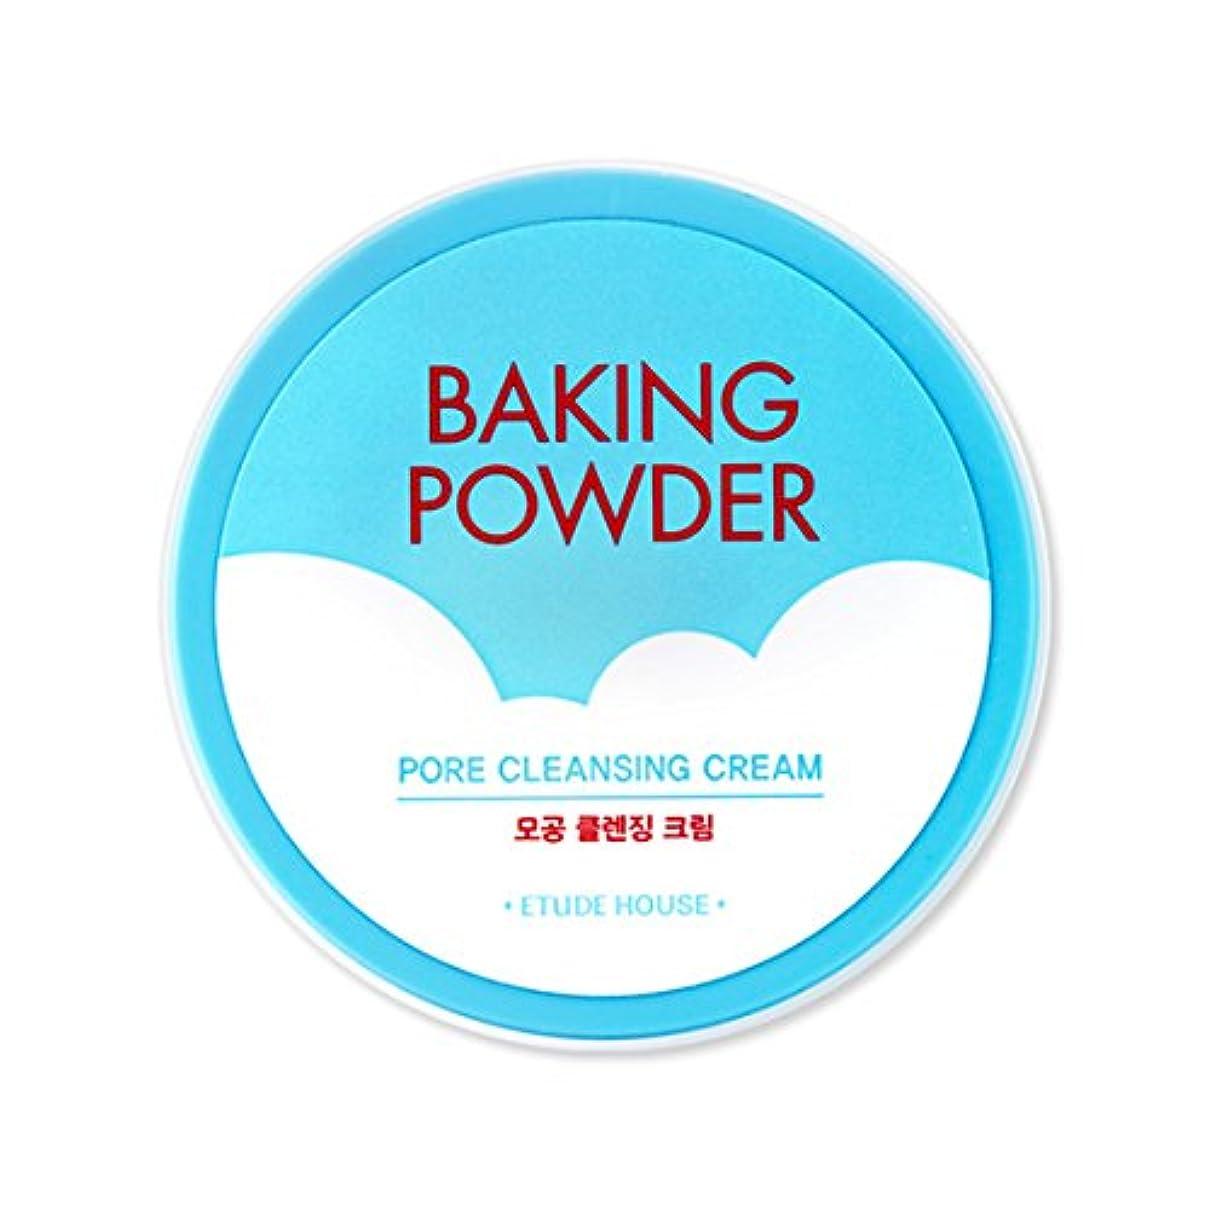 [2016 Upgrade!] ETUDE HOUSE Baking Powder Pore Cleansing Cream 180ml/エチュードハウス ベーキング パウダー ポア クレンジング クリーム 180ml...